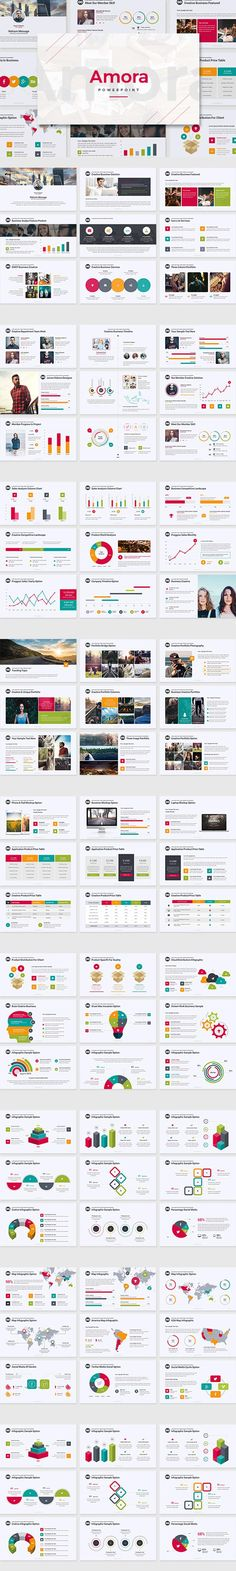 #presentation #template from zigens   DOWNLOAD: https://creativemarket.com/zigens/708486-Amora-Powerpoint-Template?u=zsoltczigler